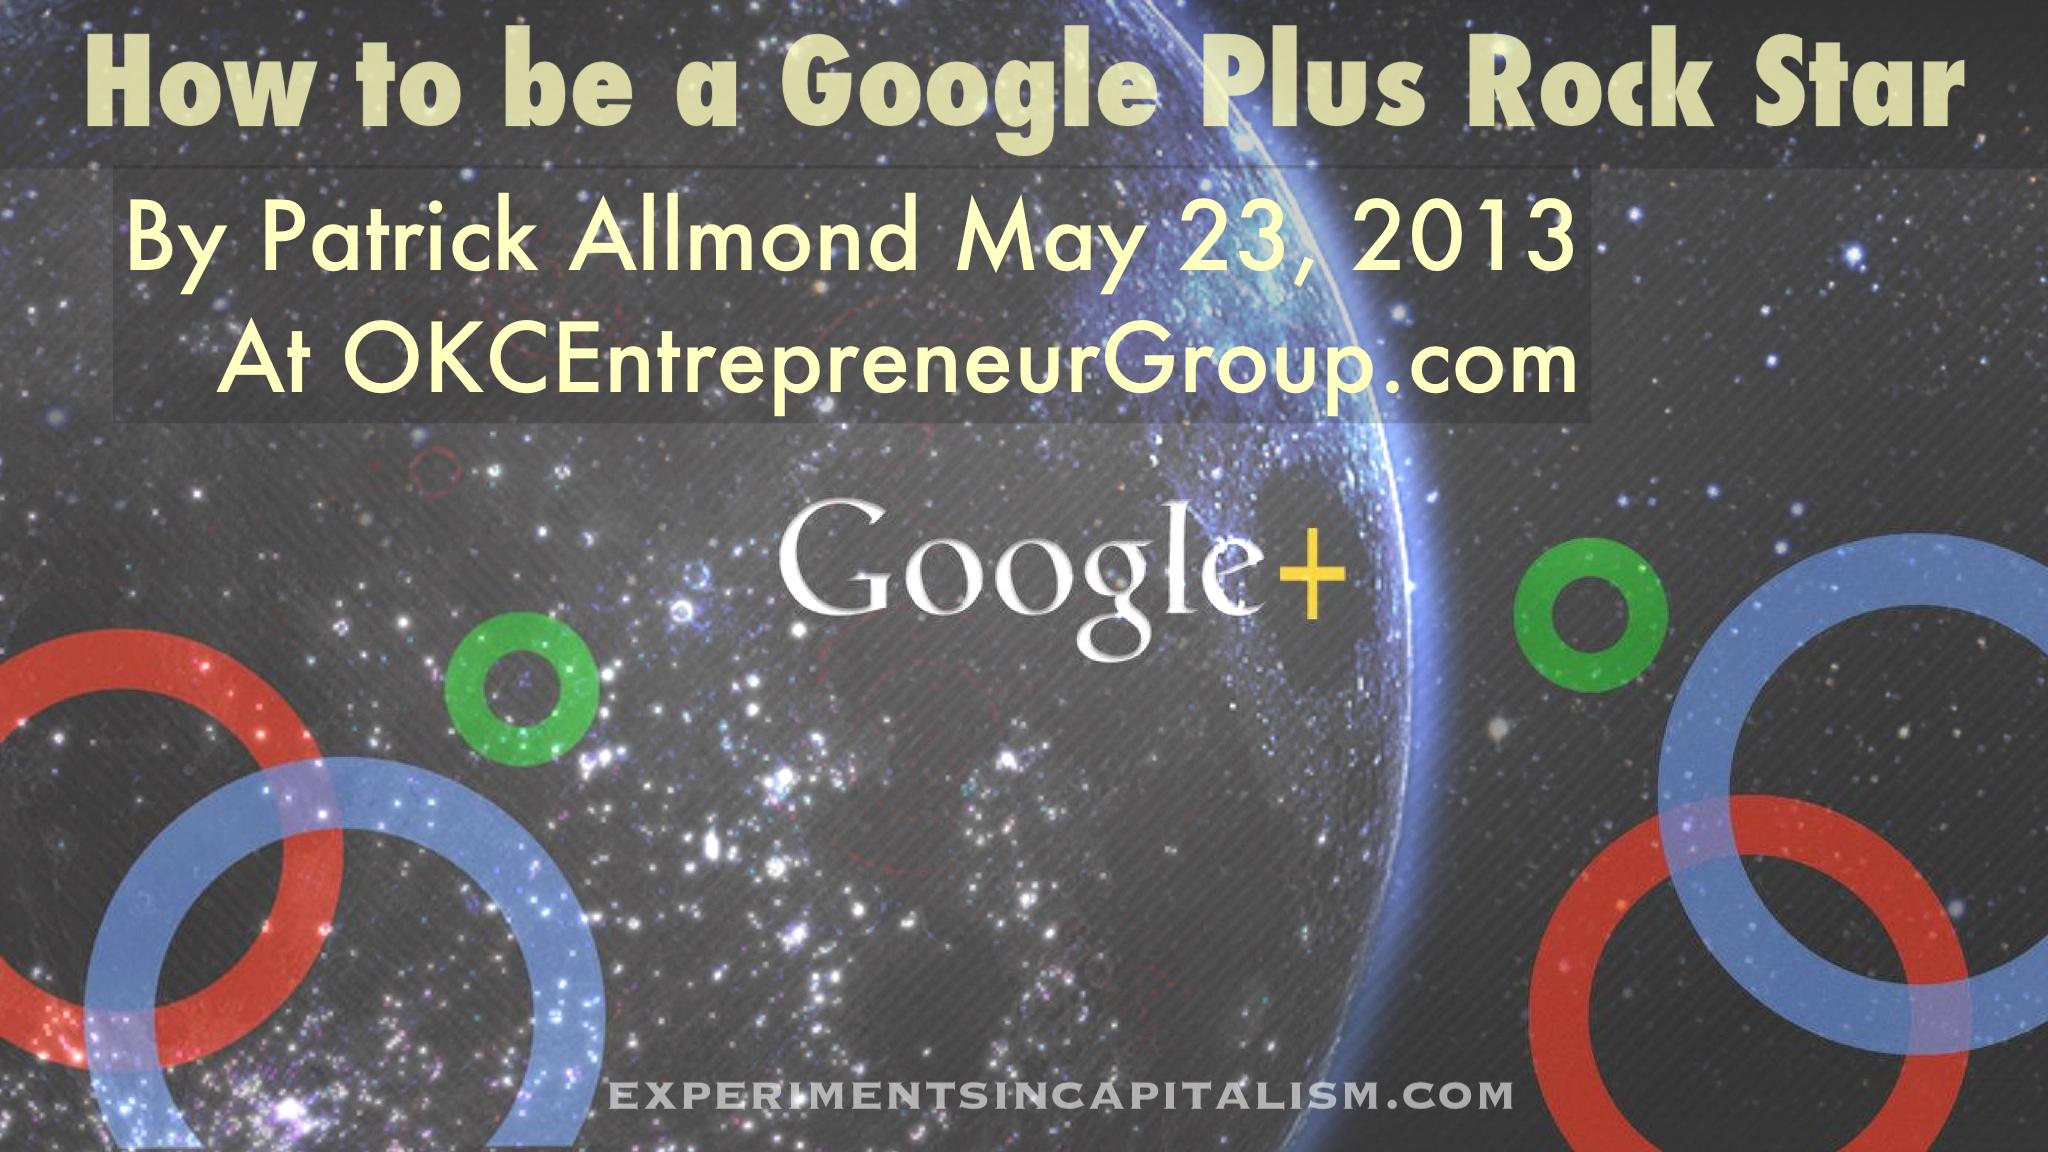 How to Be a Google Plus Rock Star - Patrick Allmond @OkcEntrepreneurGroup.com  (4).jpg